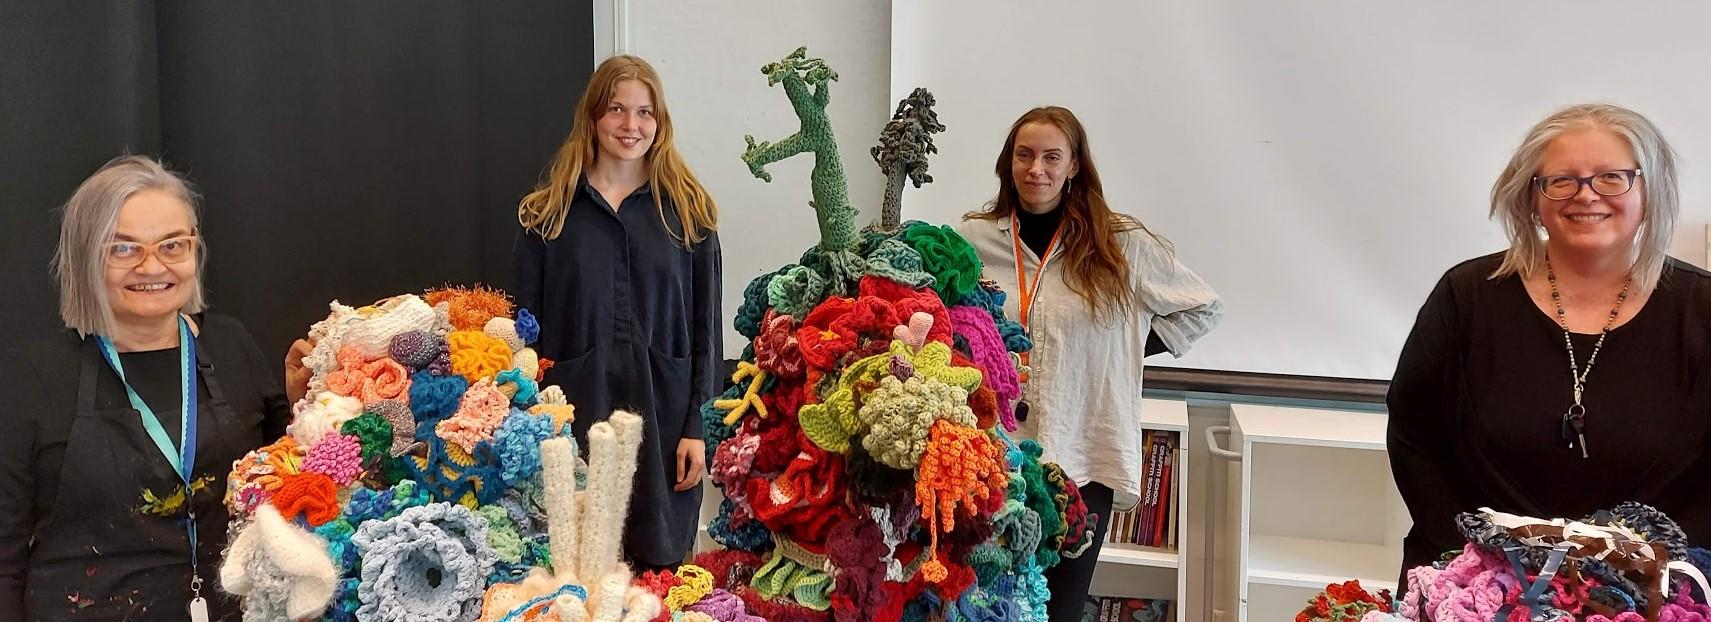 Women constructing crochet coral reefs